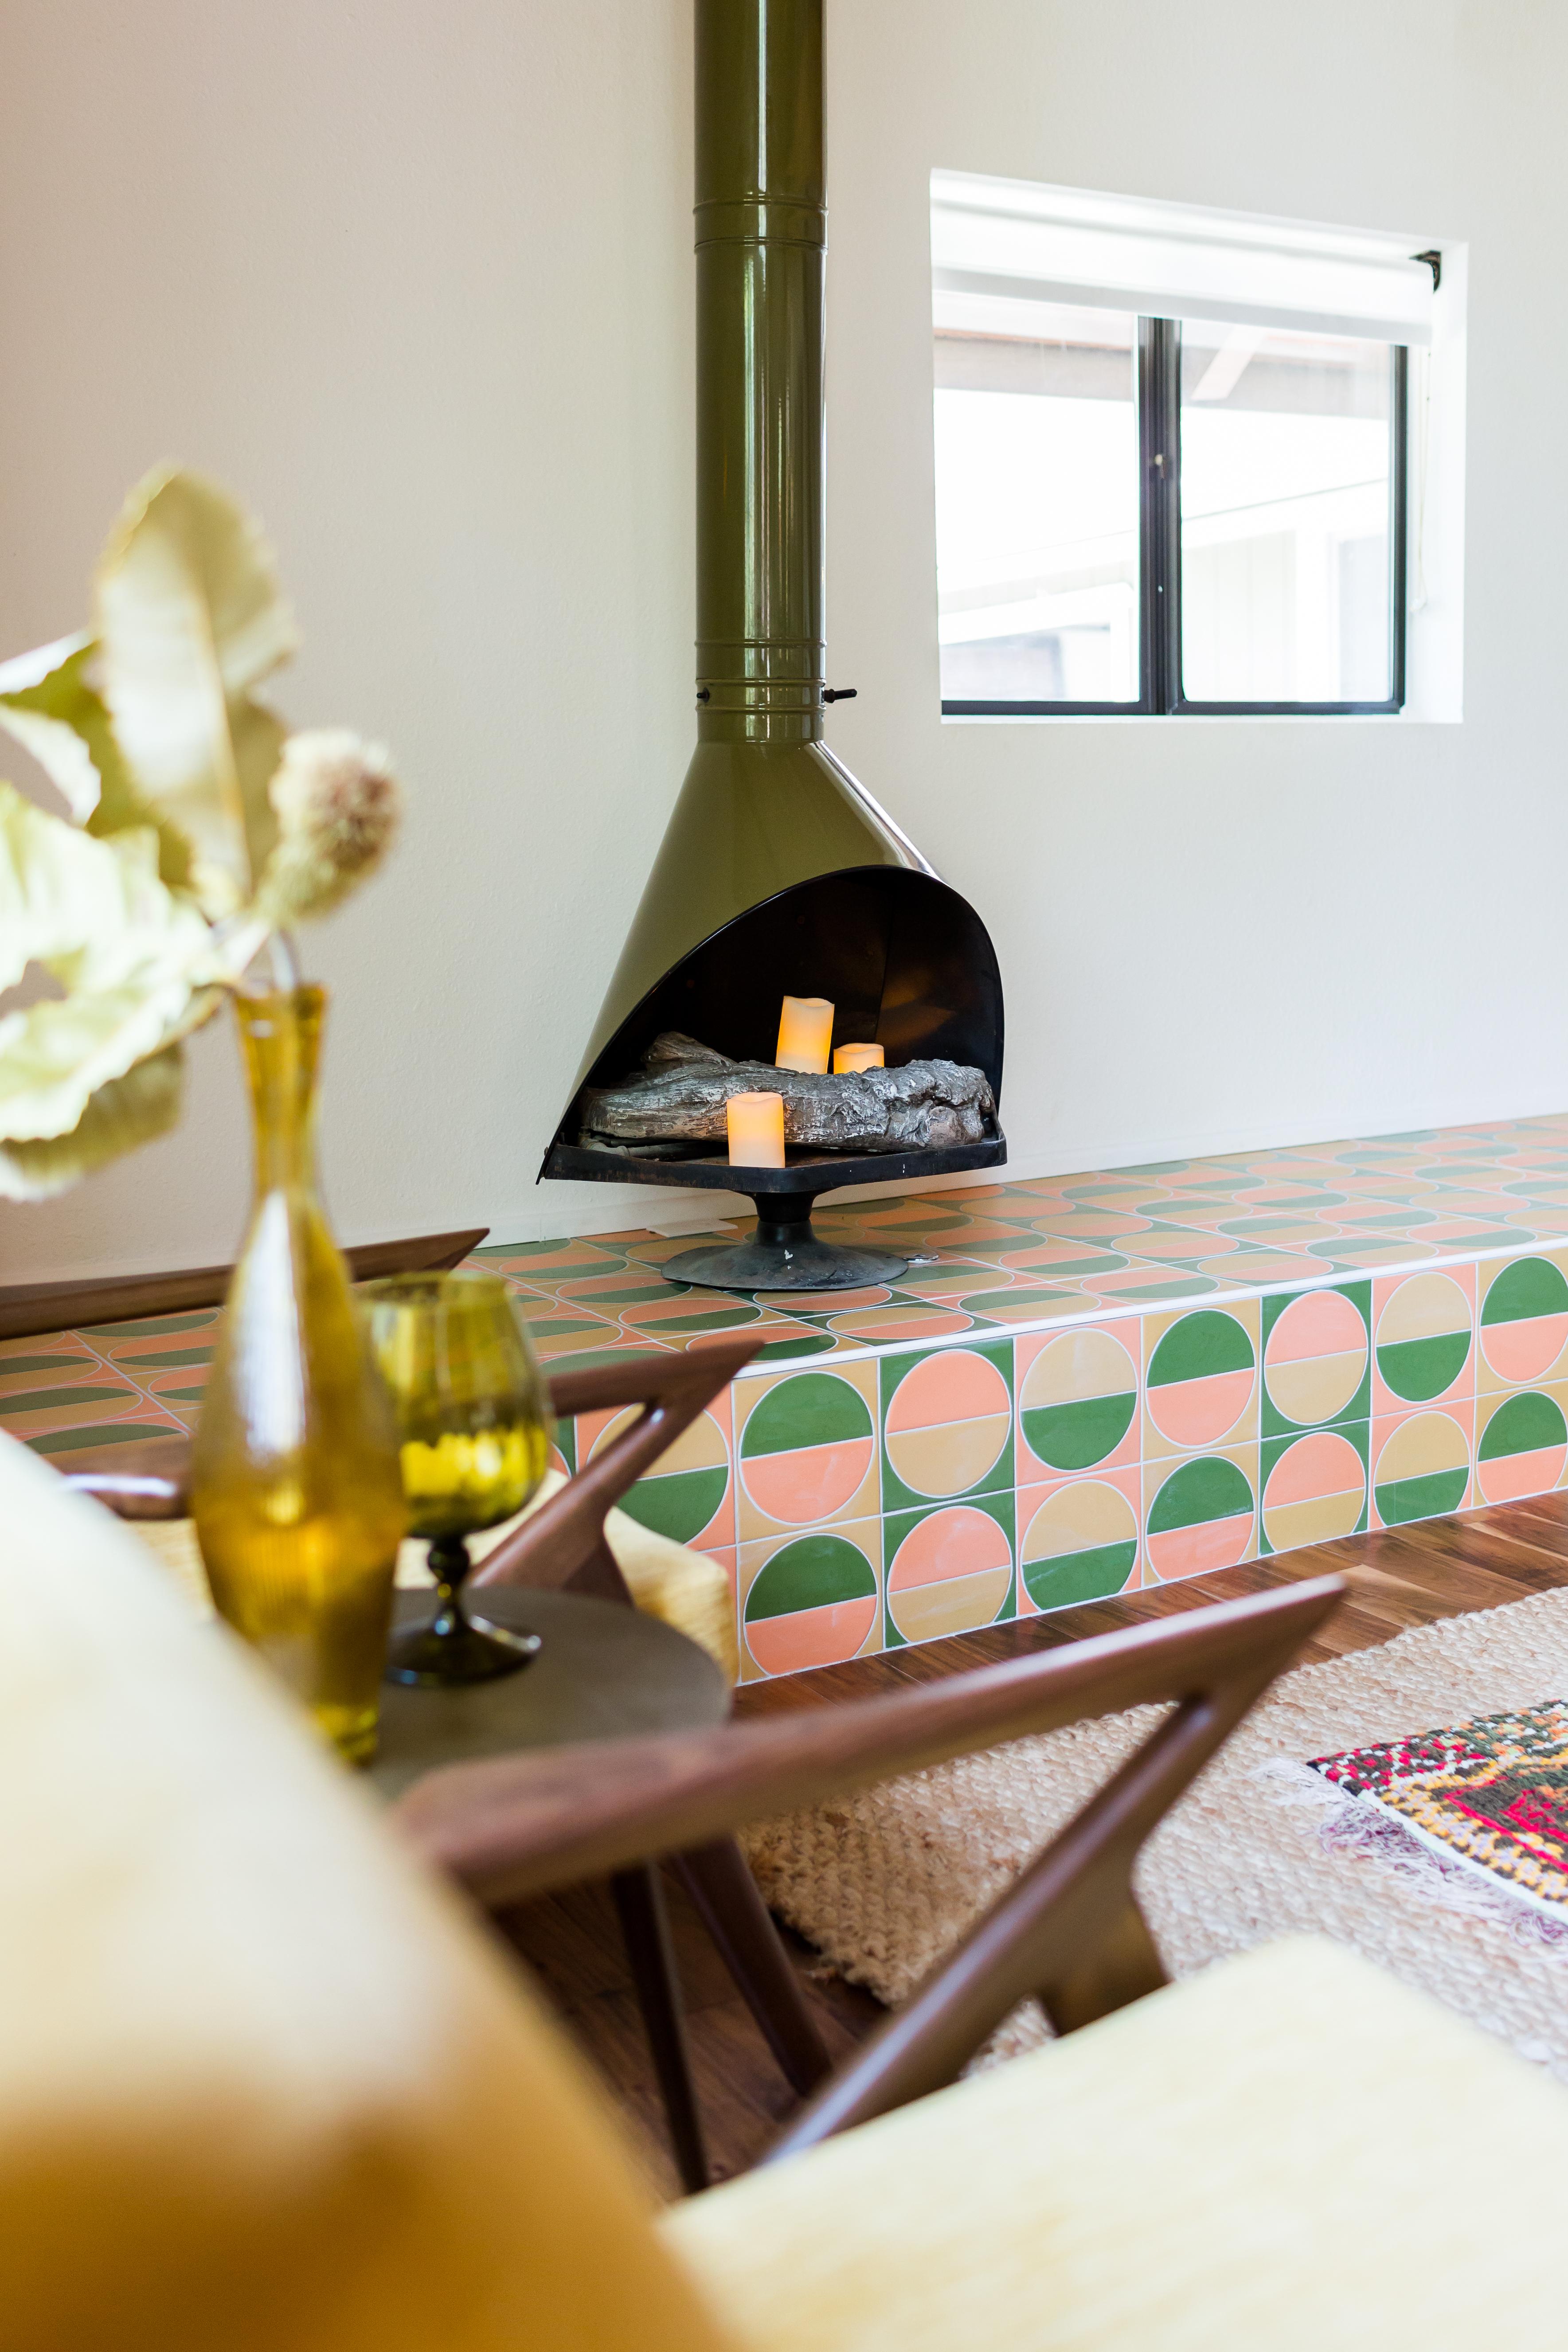 Handpainted Harvest tiles in Sorbet, Sunflower and Spruce Gloss.